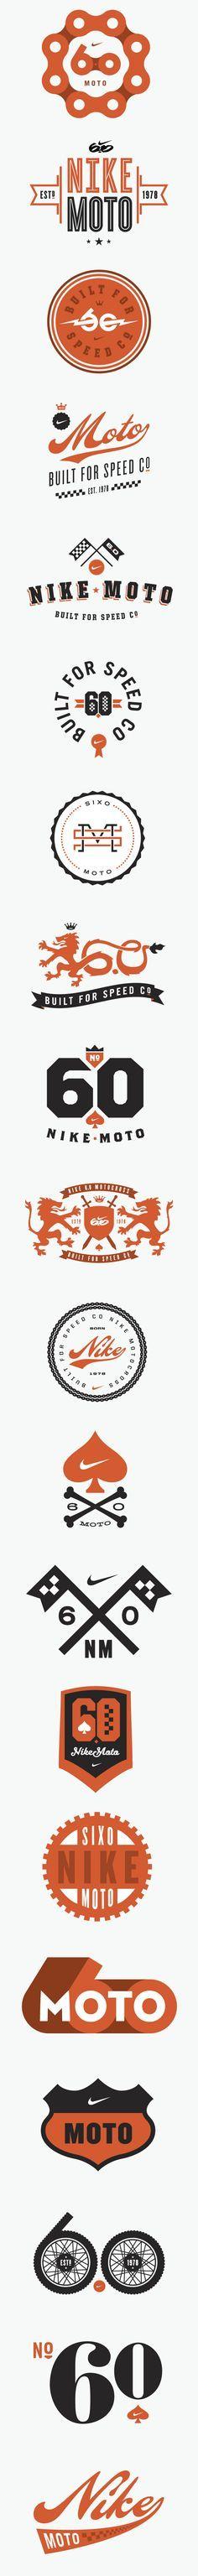 Nike 6.0 Motocross Logos    bike vintage chain sports yadda yadda yadda                                                                                                                                                                                 More